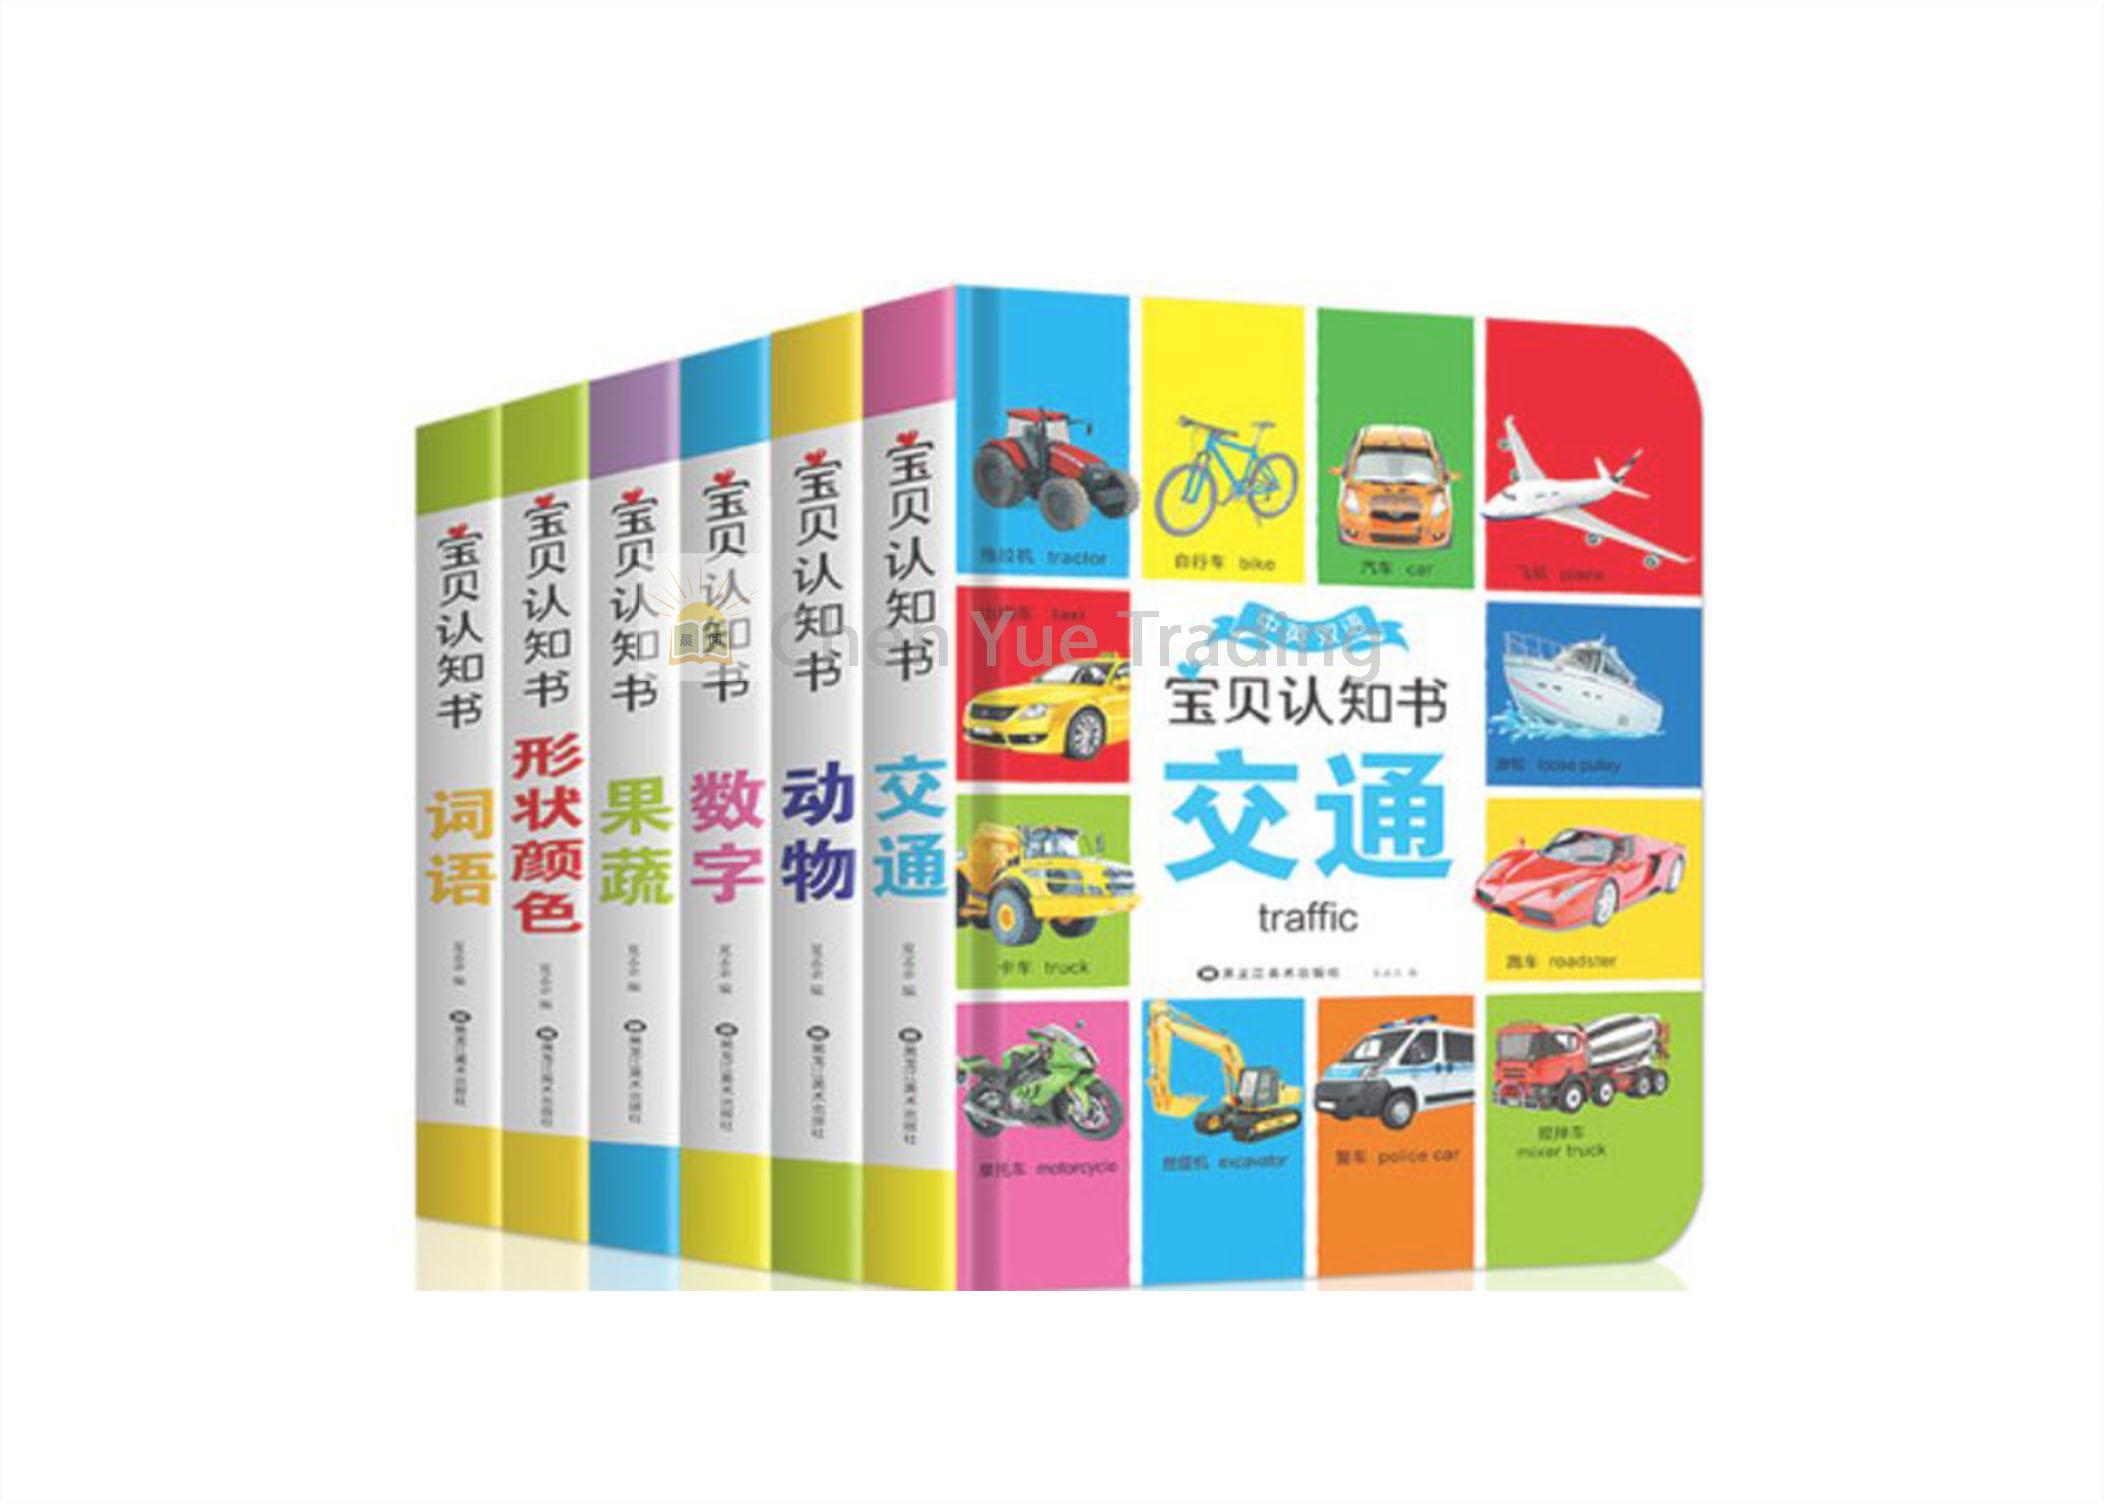 Ready Stock- Children learning books 全6册宝宝认知书交通 + 数字 + 动物 + 蔬果+ 形状颜色 + 词语